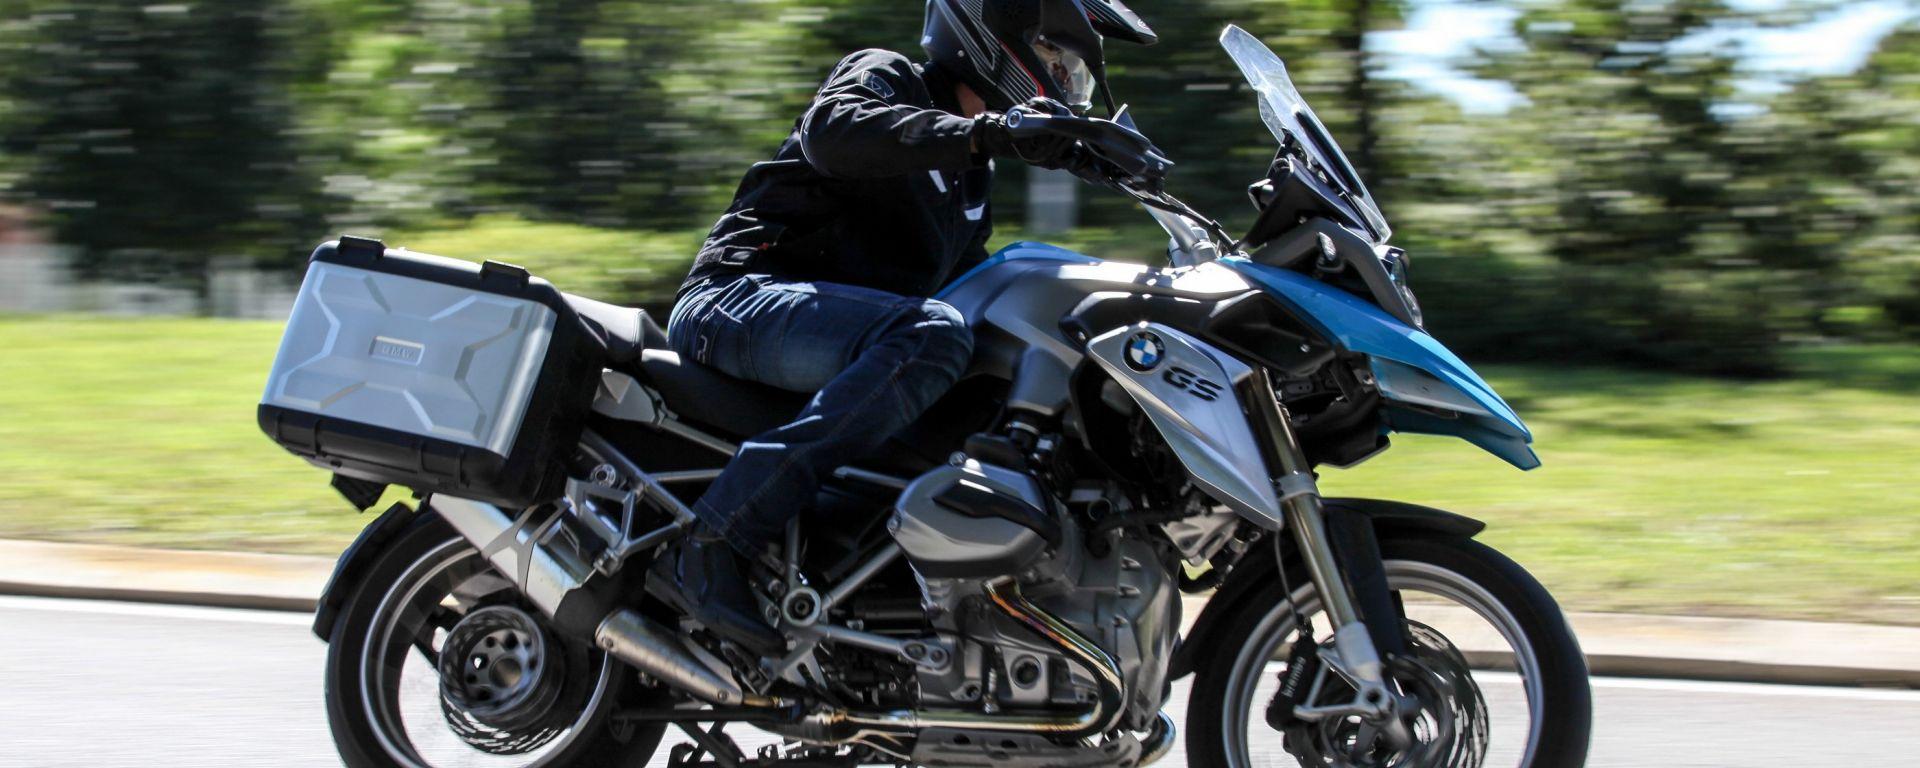 BMW Motorrad: l'ABS Pro arriva su GS, S1000 RR e S1000 XR